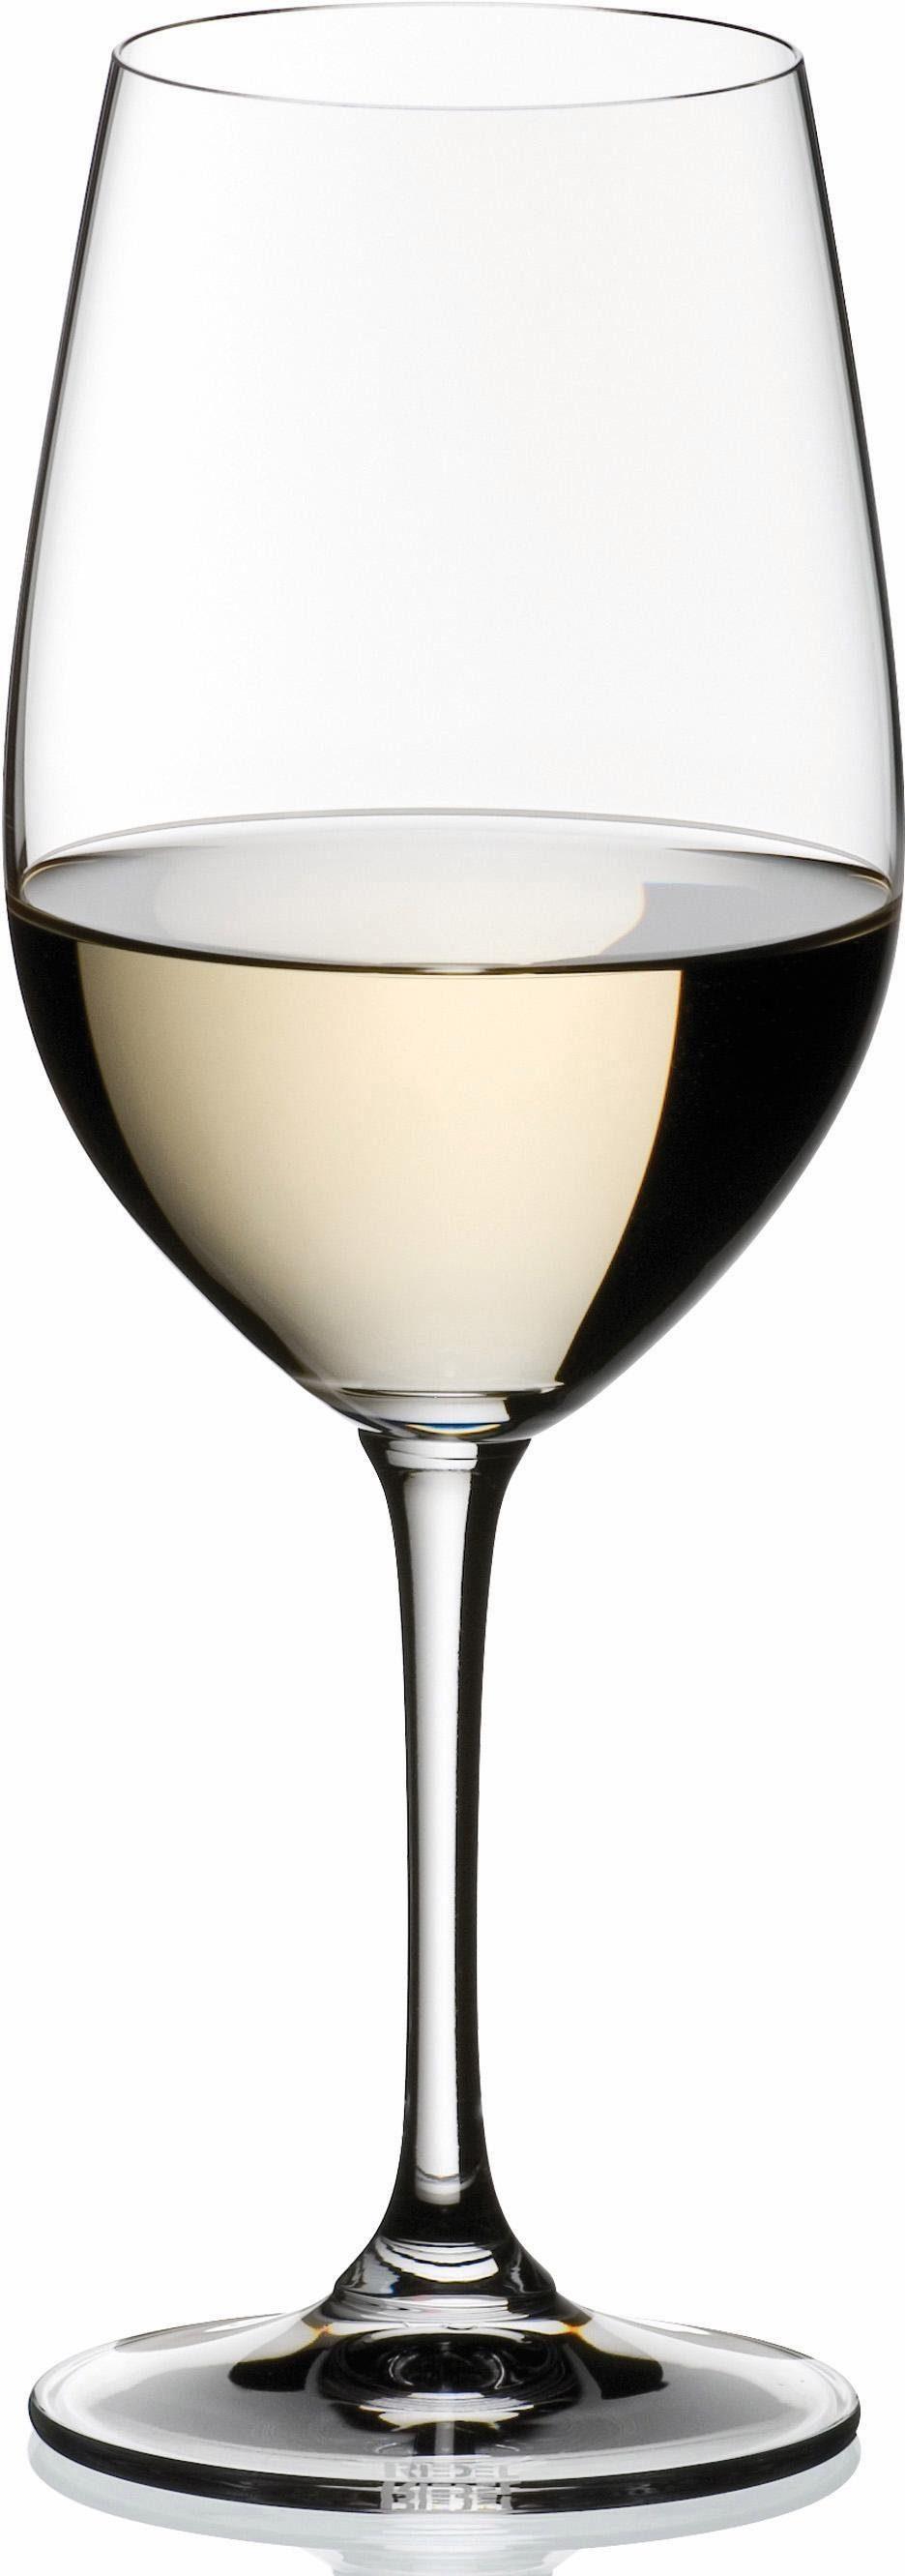 RIEDEL GLASS Wein-Glas, Zinfandel/Riesling Grand Cru, Made in Germany, »Vinum«